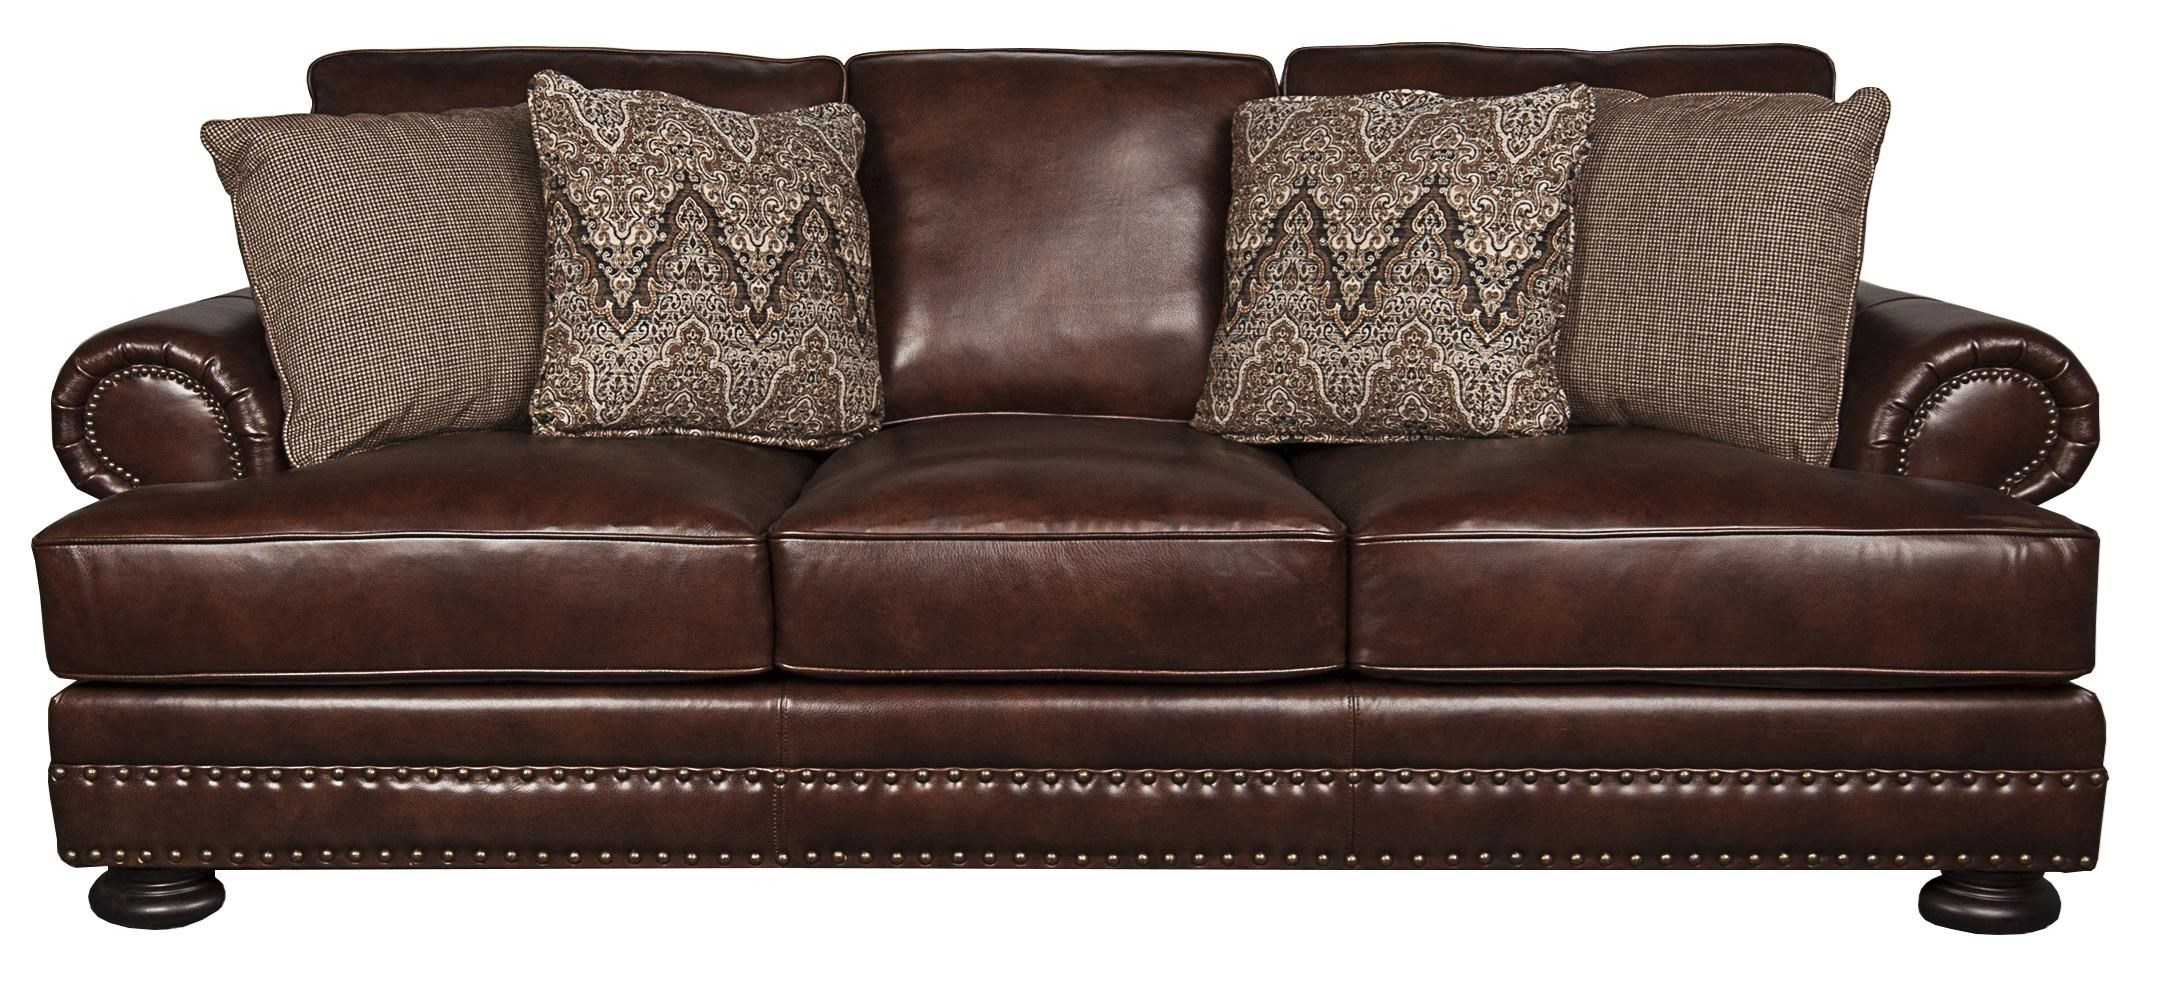 bernhardt foster classic 100 leather sofa with nailhead trim and rh morrisathome com 100 leather sofa sale 100 italian leather sofas